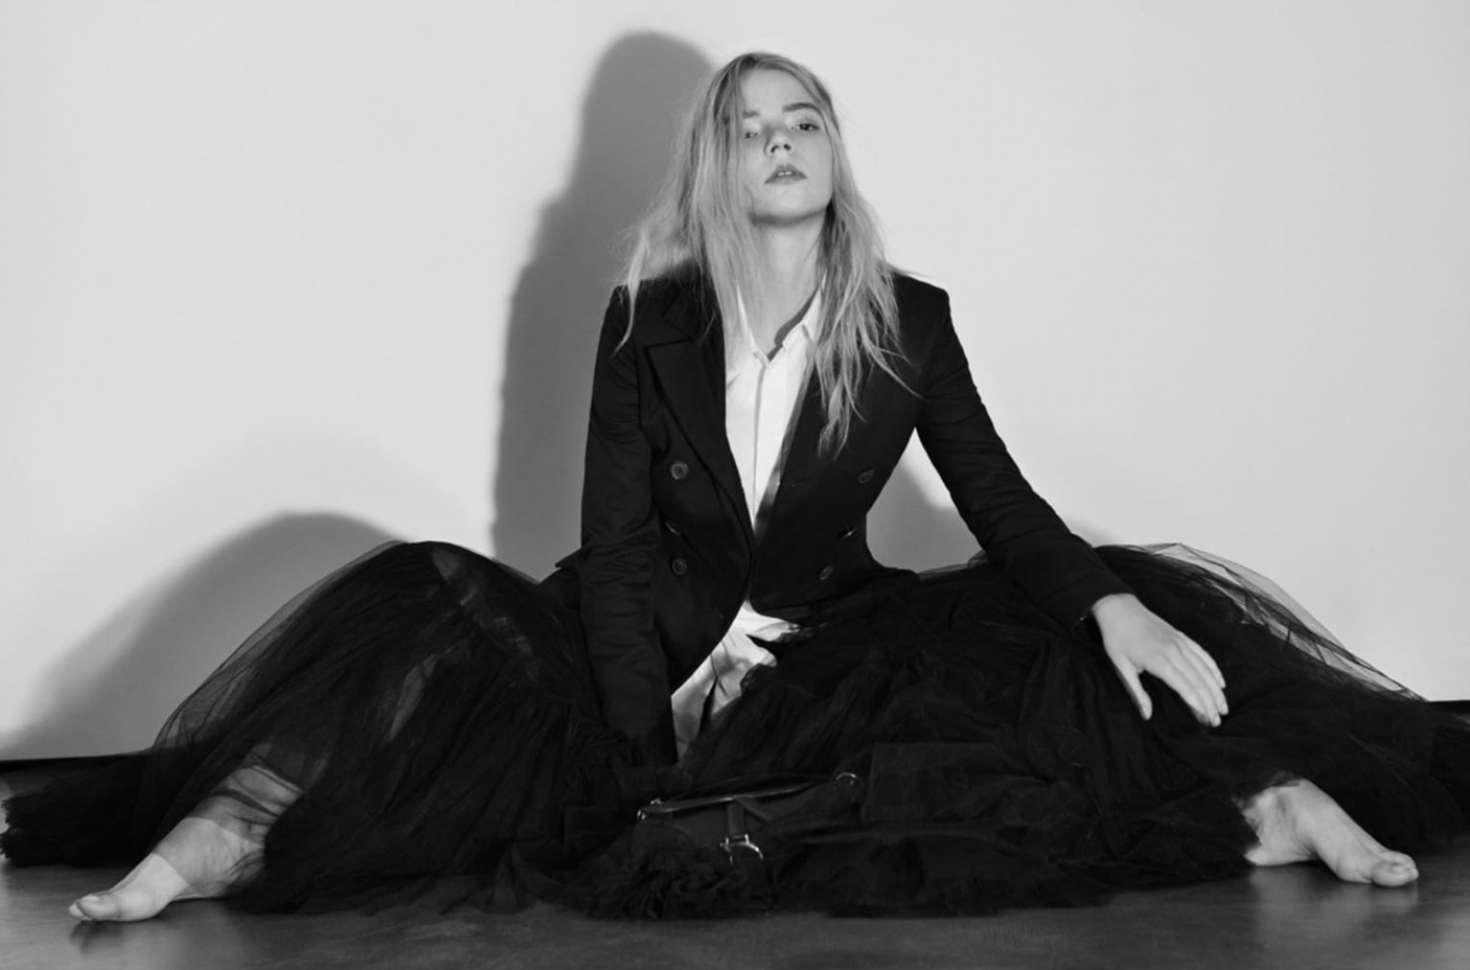 Anya Taylor Joy Dazed Magazine 2018 01 Gotceleb